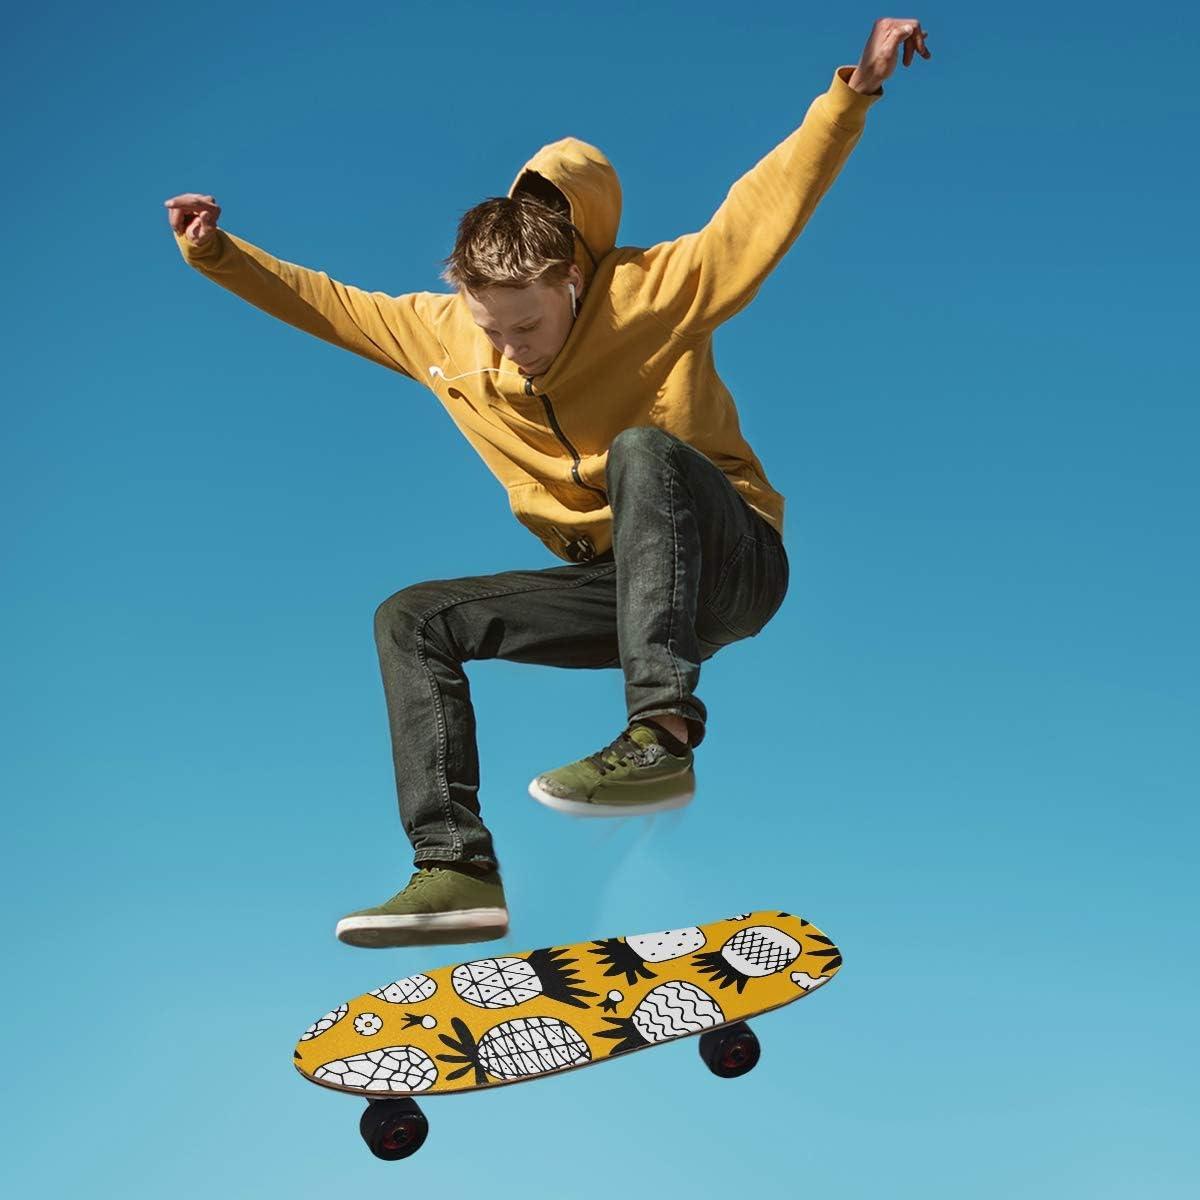 MNSRUU Skateboard Griptape Ananas-Set Blatt Scooter Deck Sandpapier 22,9 x 83,8 cm